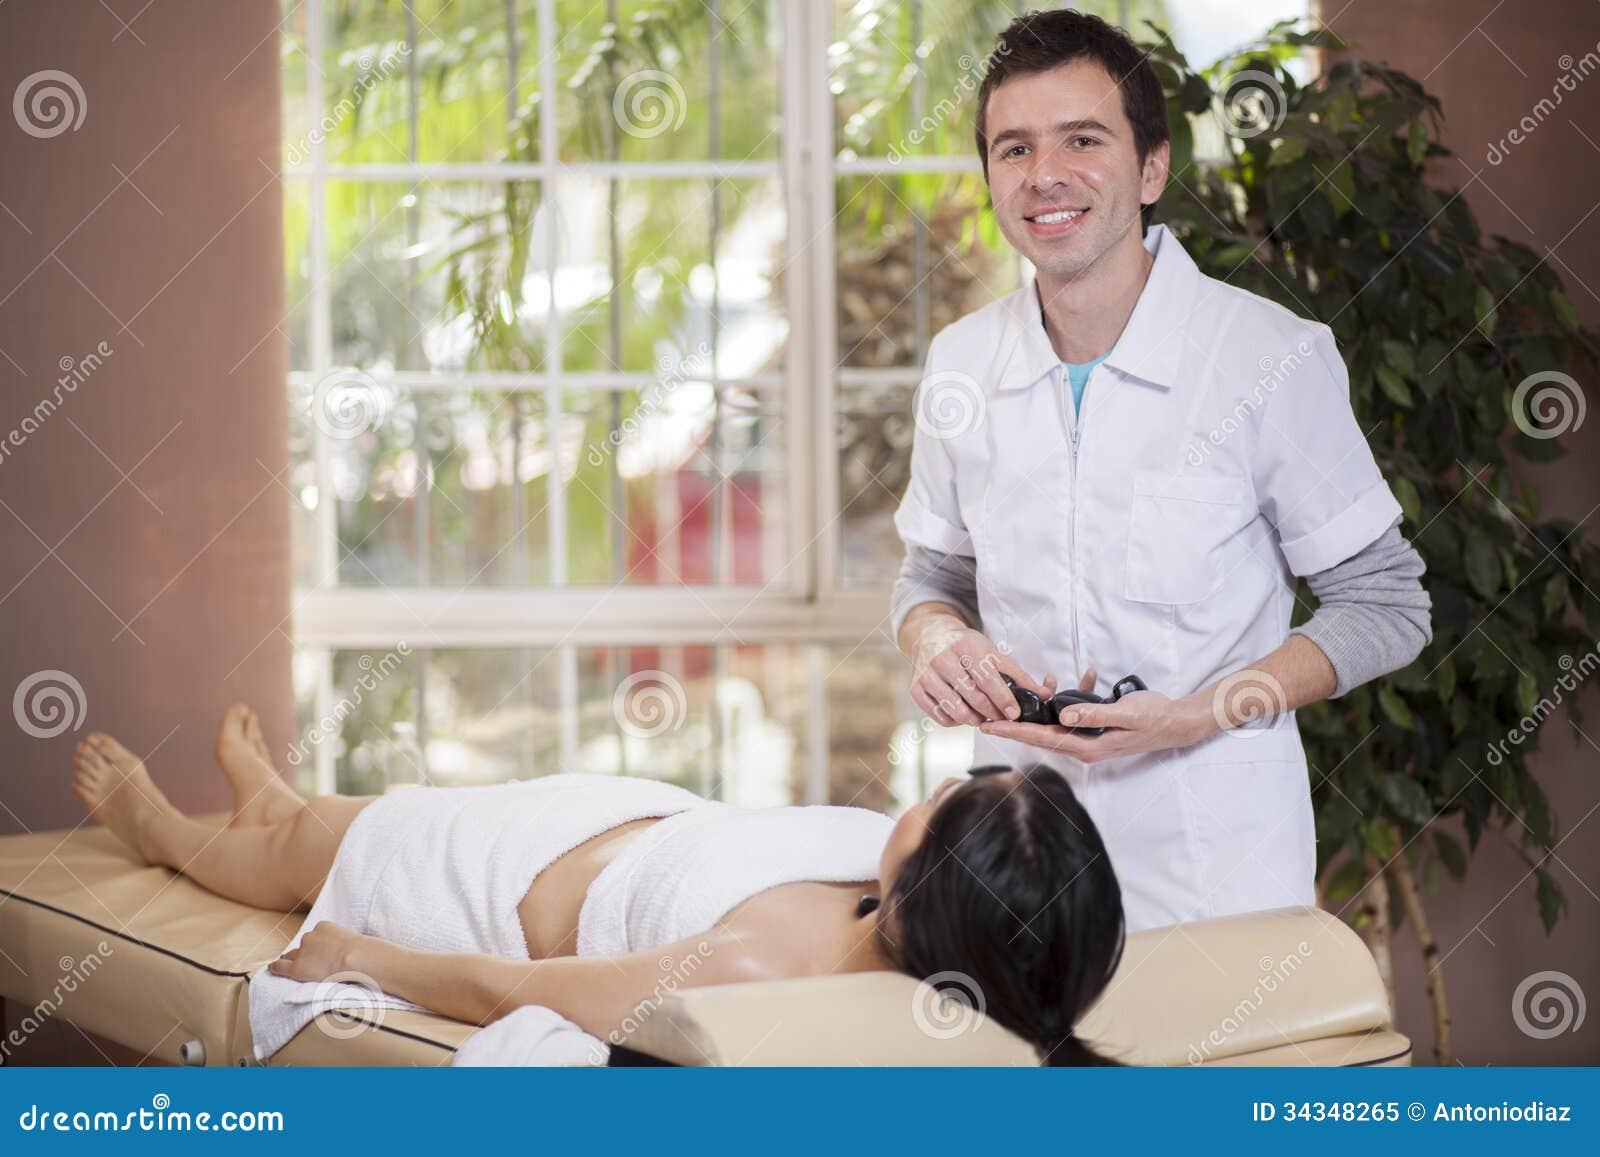 Brazilian girl in bondage and sex